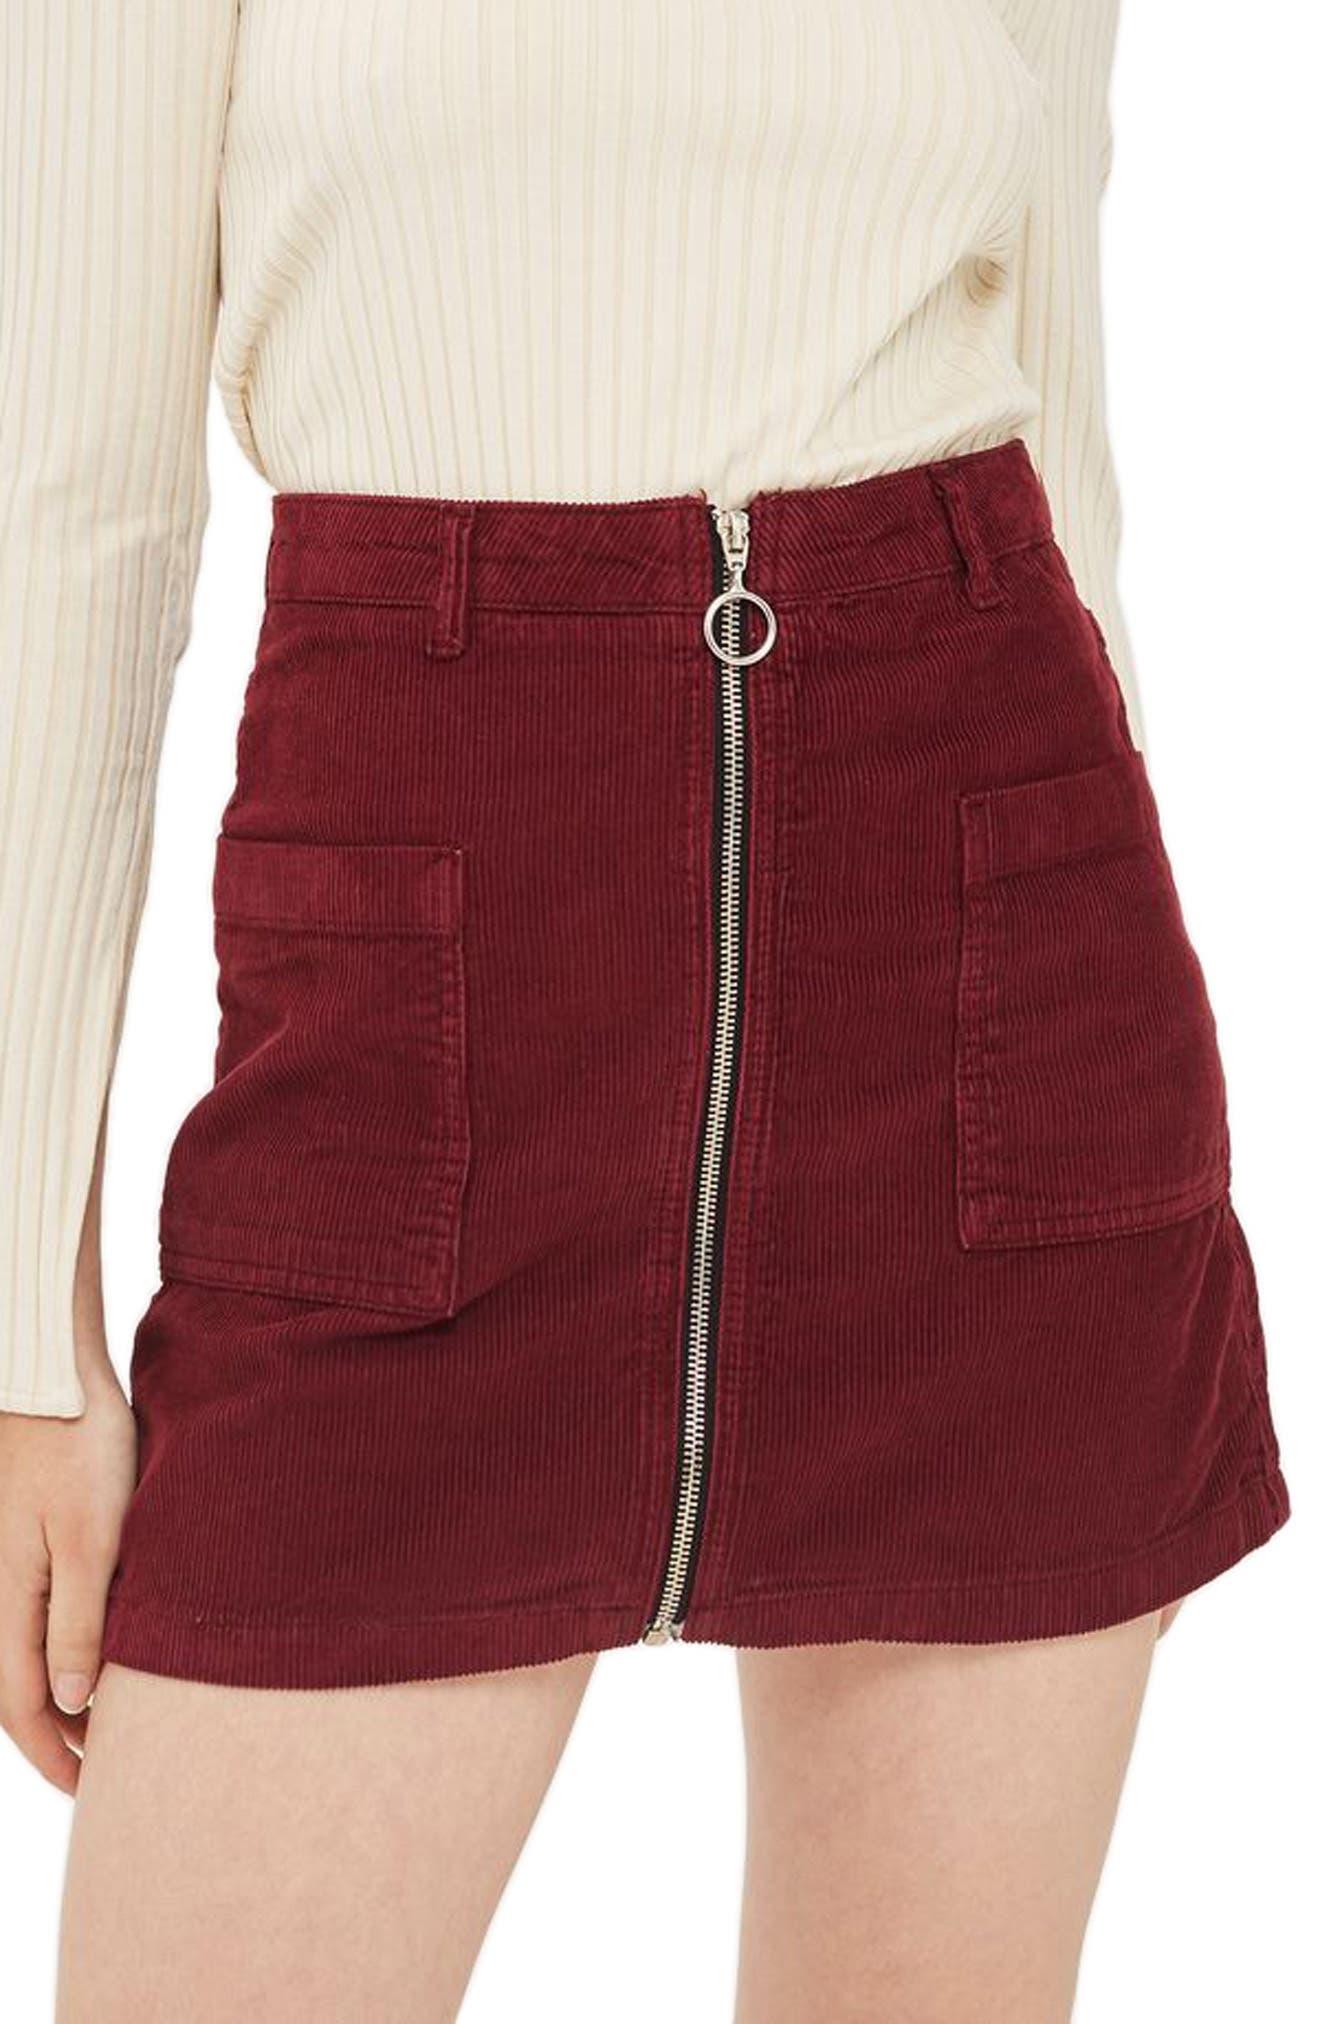 Main Image - Topshop Zip Through Corduroy Skirt